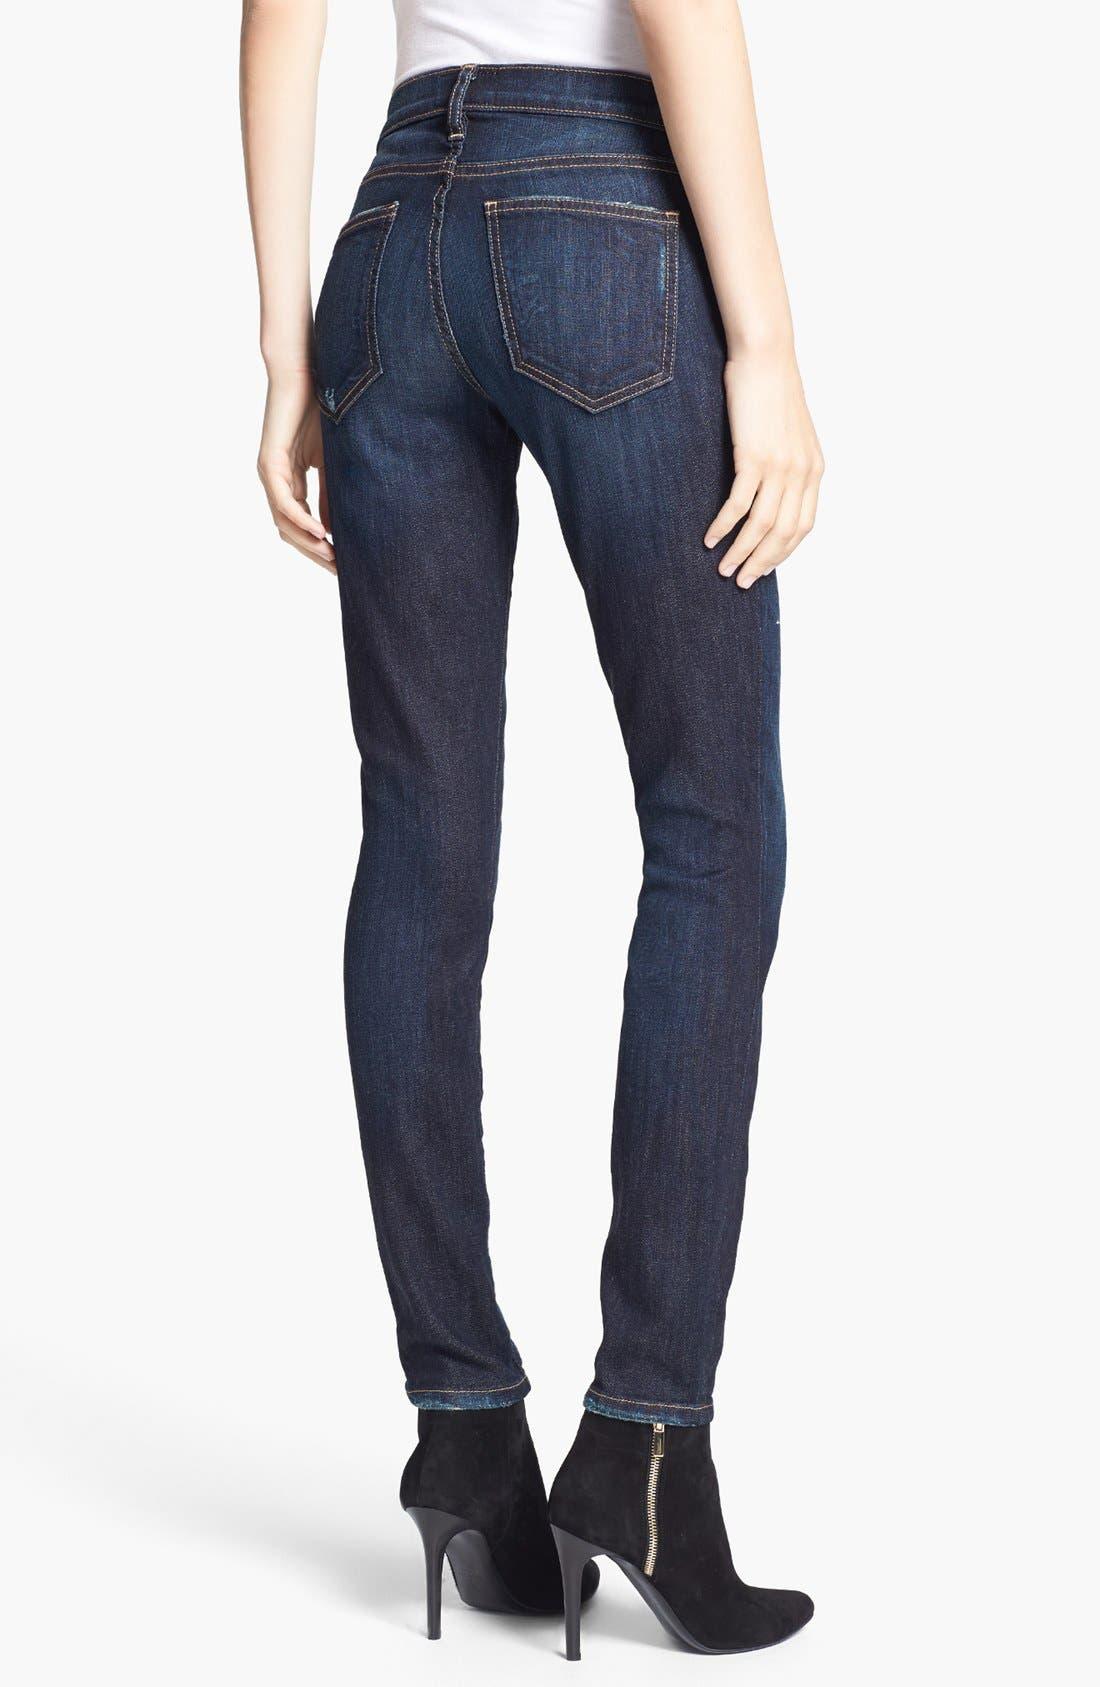 Alternate Image 2  - Current/Elliott 'The Ankle Skinny' Jeans (Richmond)